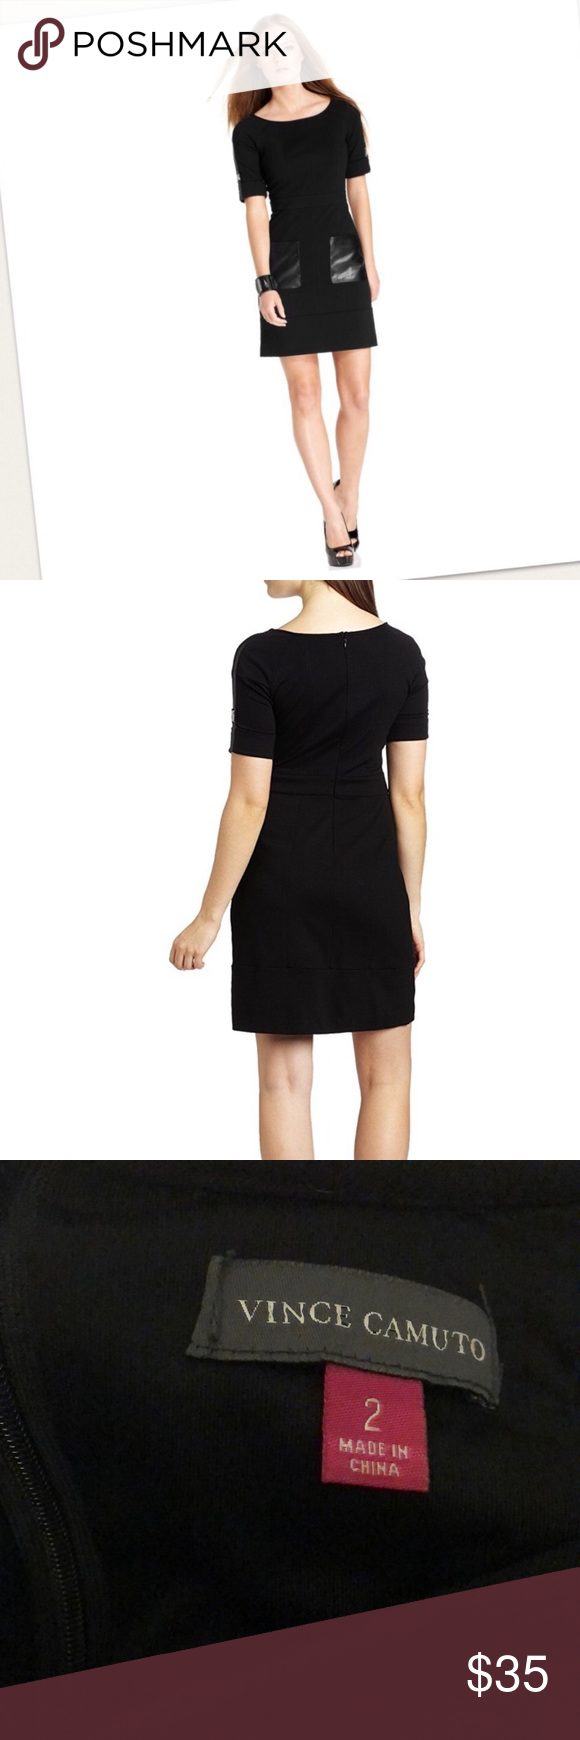 Vince Camuto Black Dress Leather Pockets 2 Vince Camuto Black Dress Leather Pockets 2 Vince Camuto Dresses Leather Dresses Dresses Black Dress [ 1740 x 580 Pixel ]